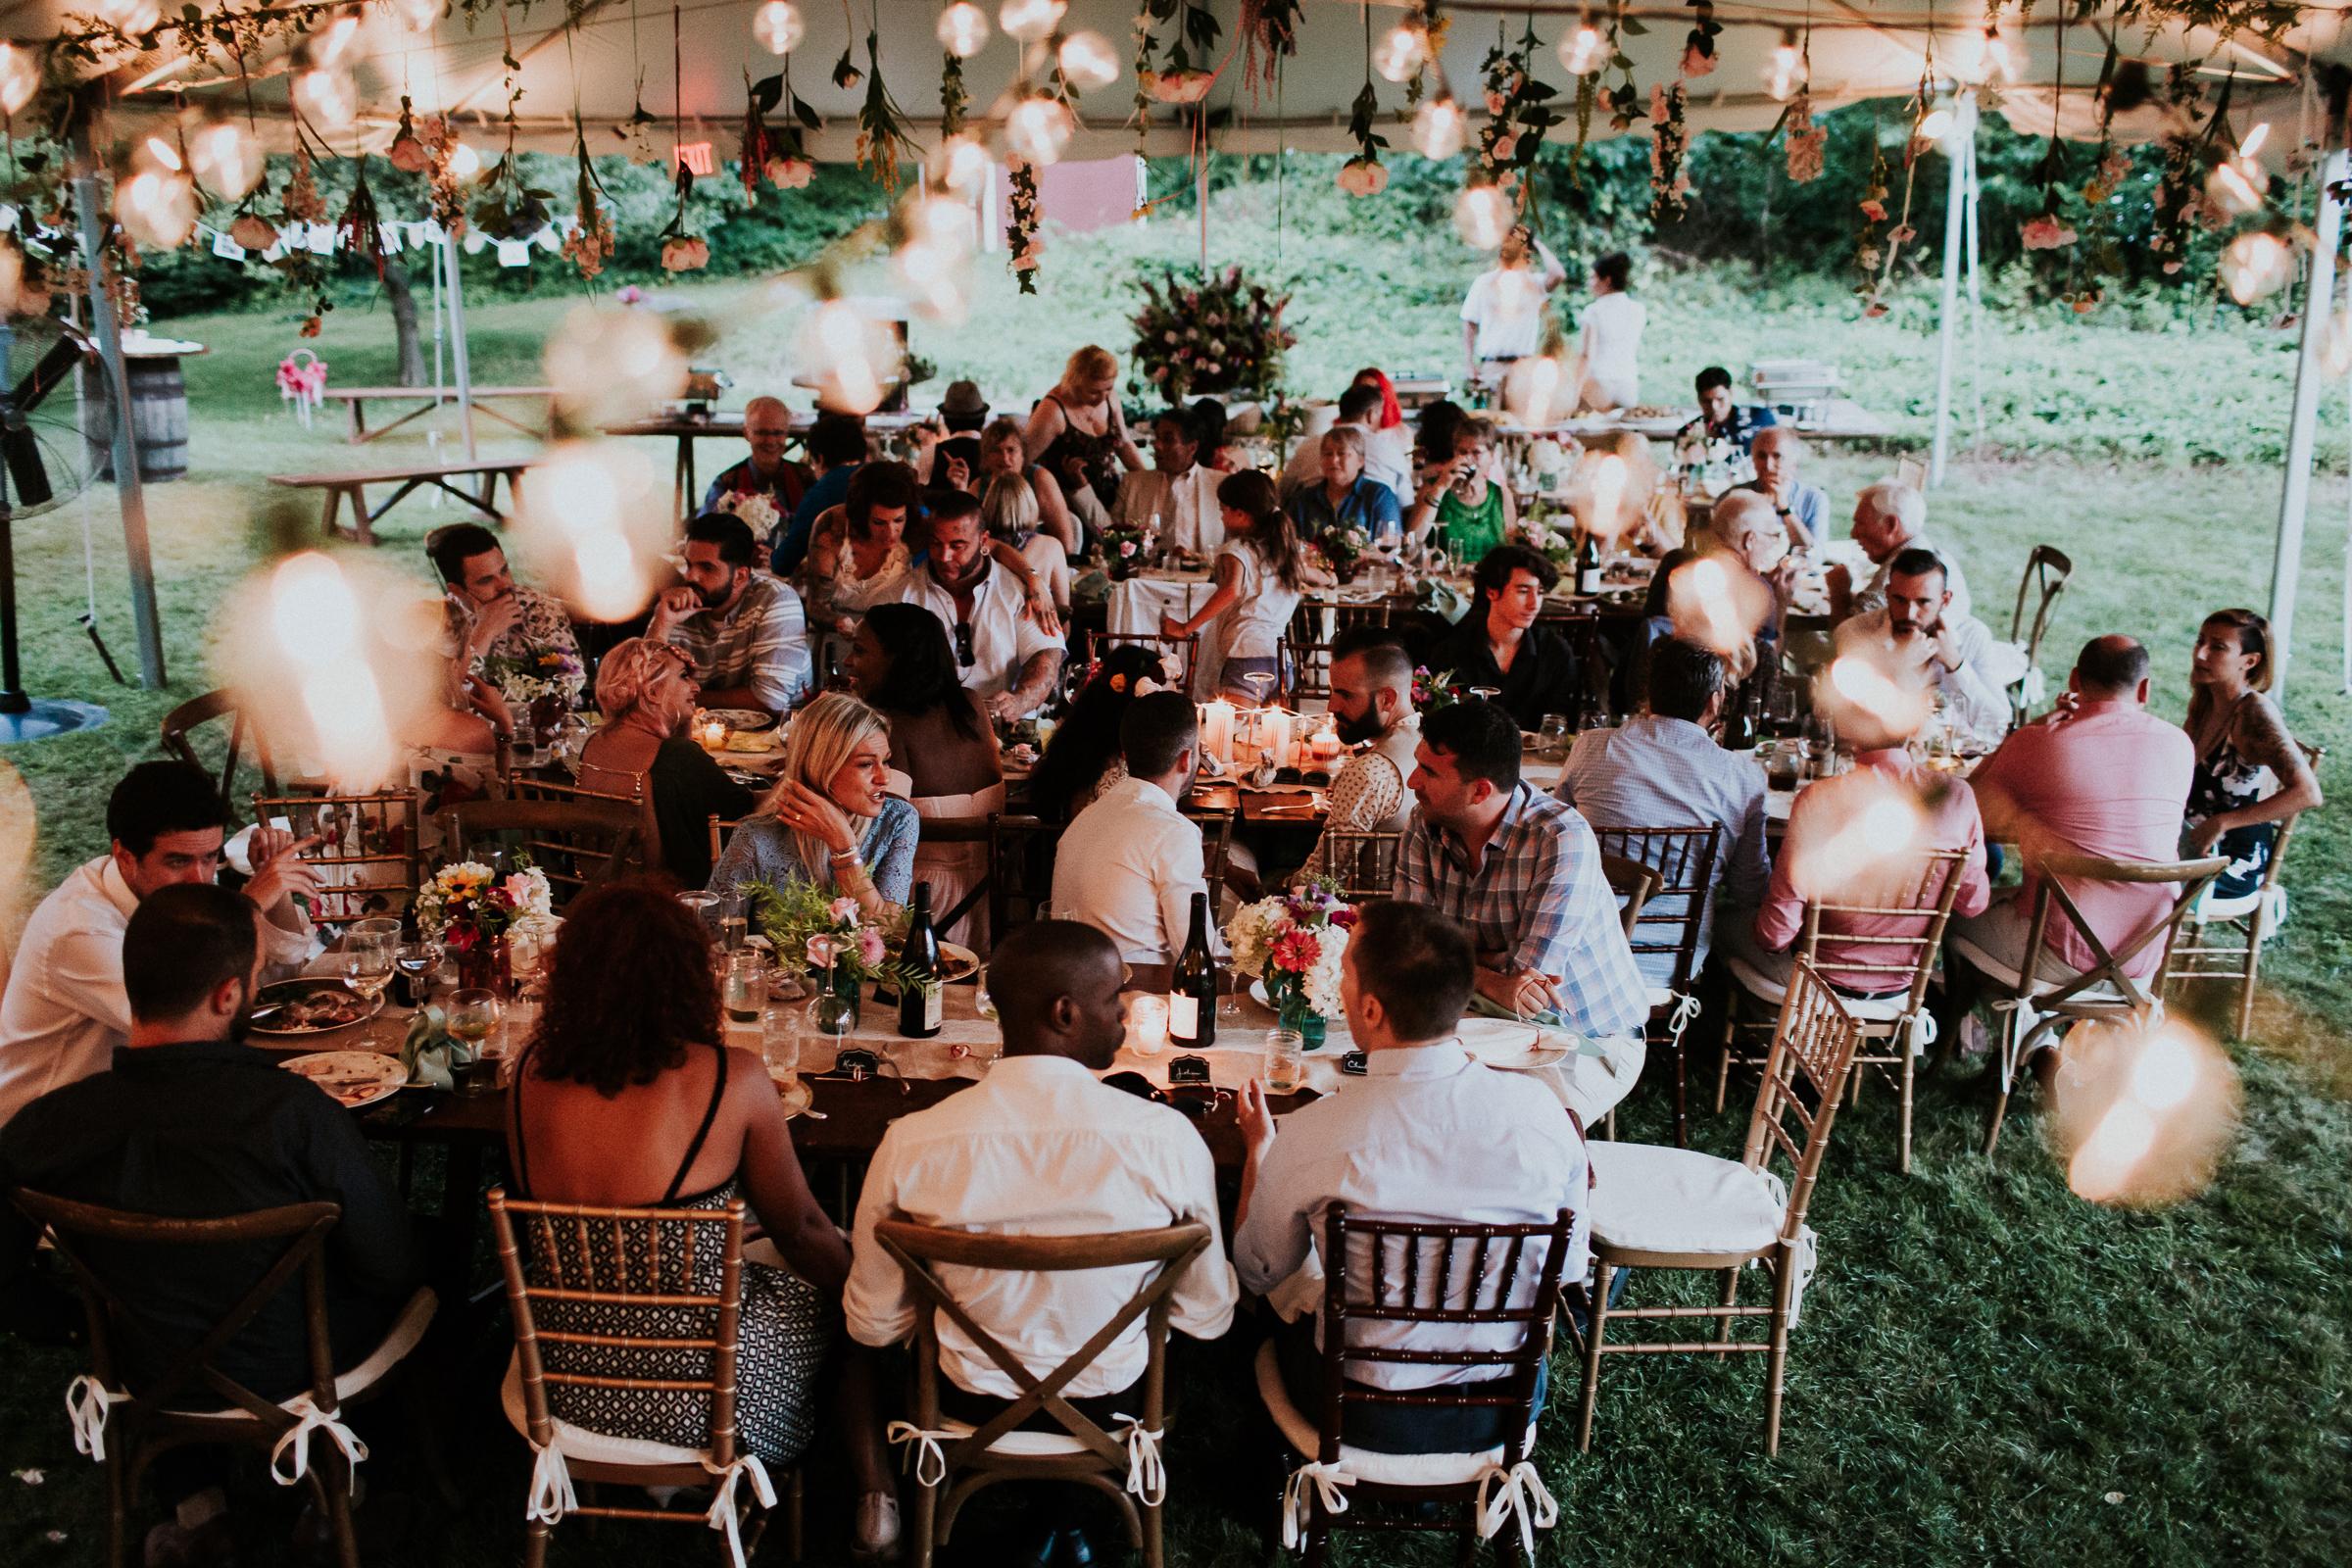 Backyard-Intimate-Adventurous-Destination-Wedding-Darien-Connecticut-Documentary-Wedding-Photography-114.jpg